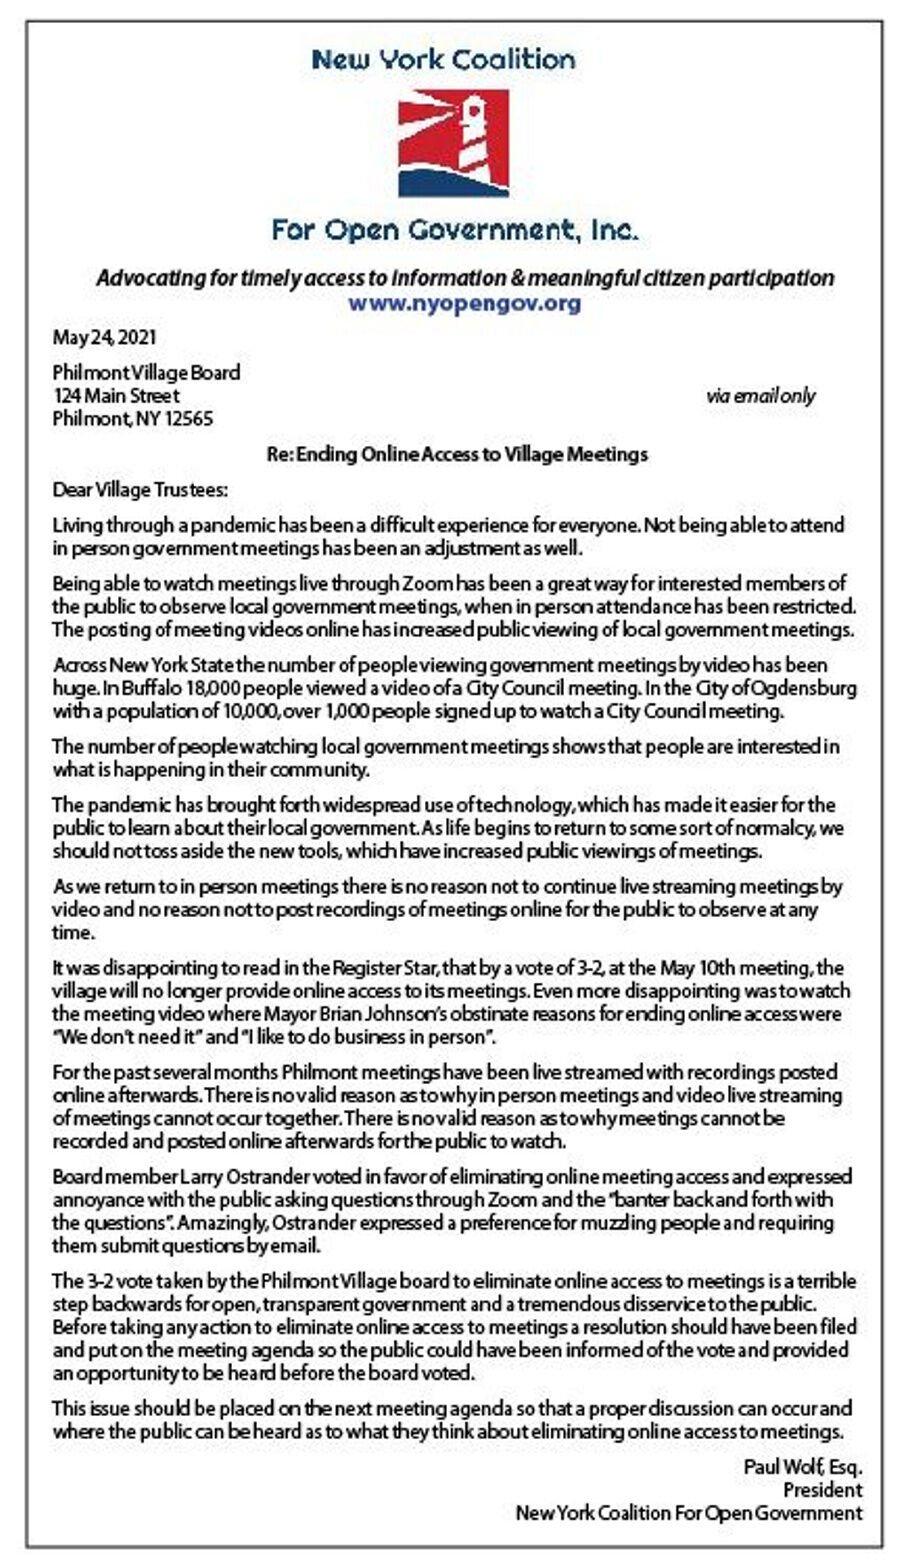 Coalition letter scolds Philmont village board